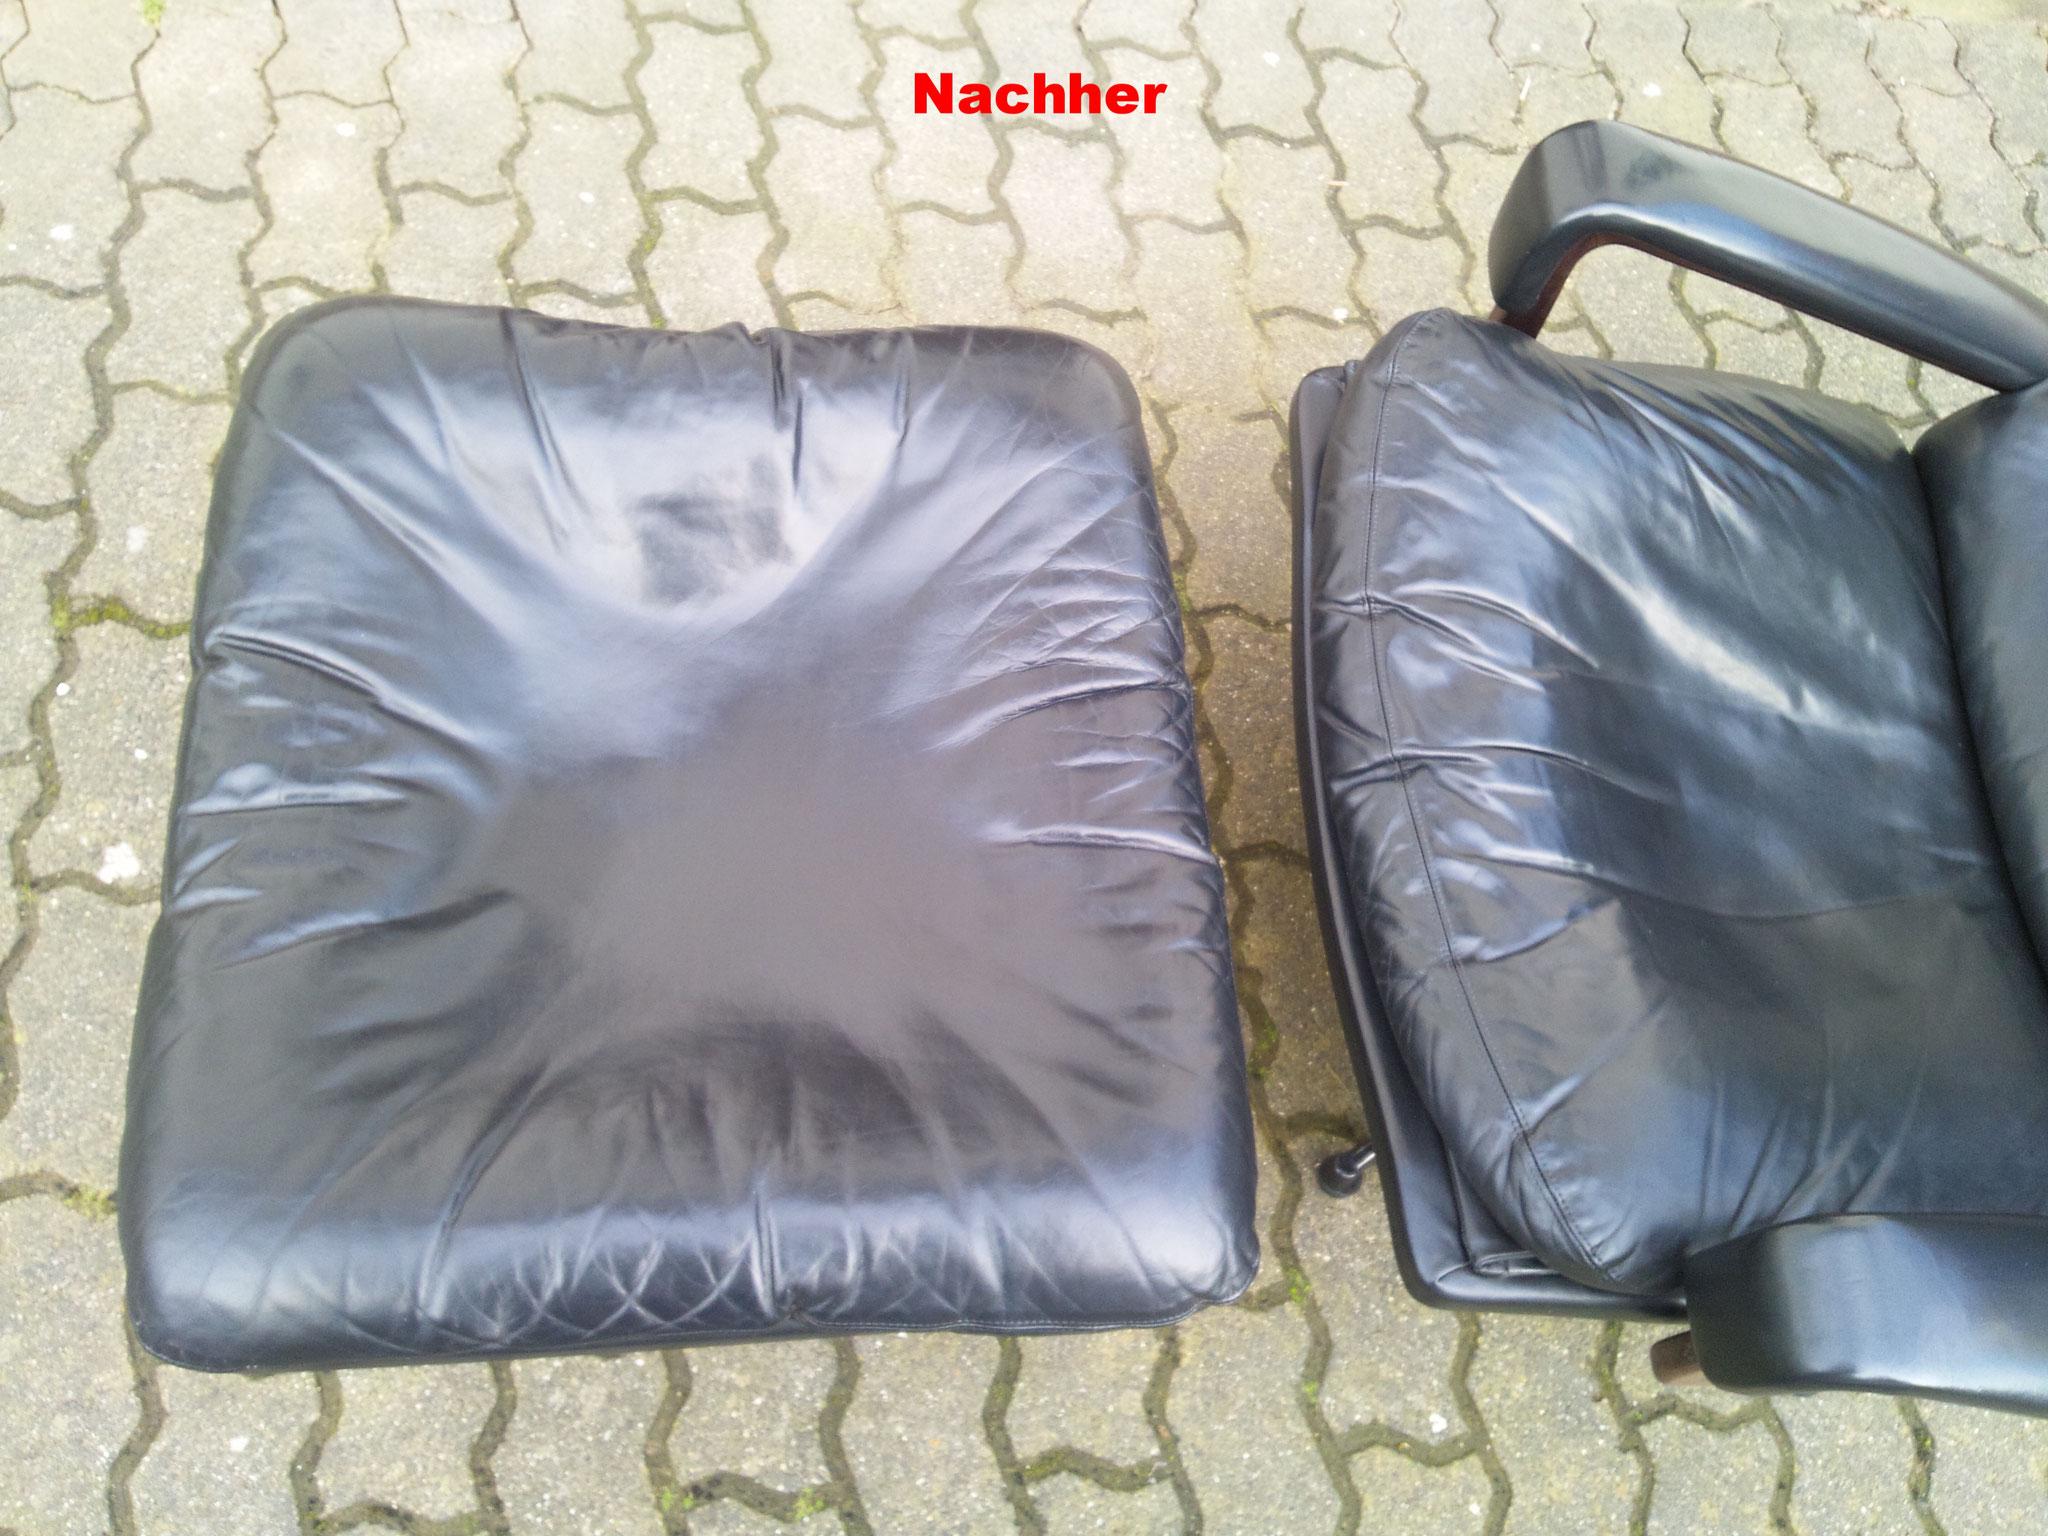 Lederreparatur Lederpflege Und Smartrepair Bundesweite Lederreparatur Aller Art